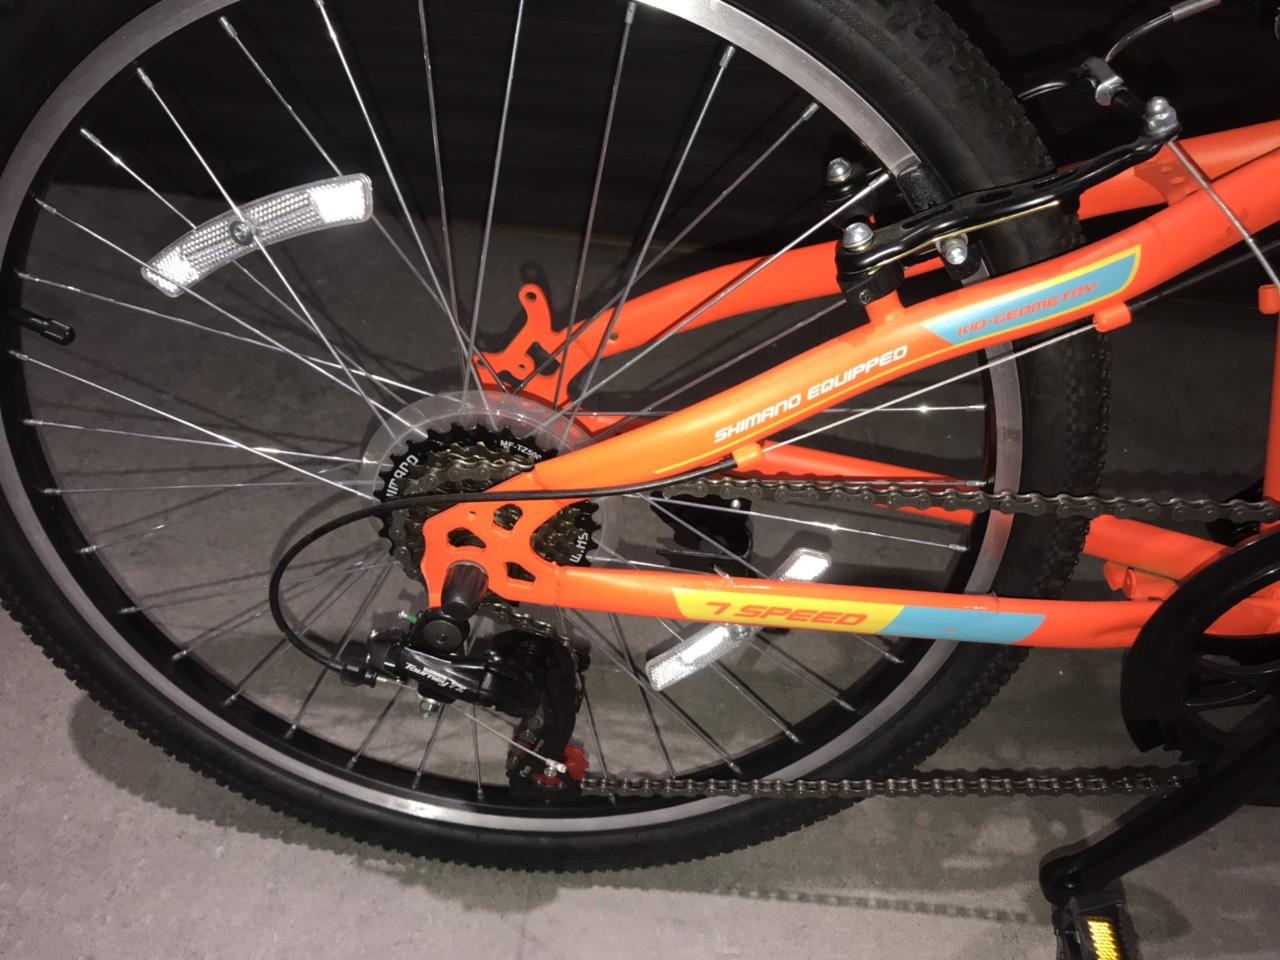 Xe đạp thể thao Phoenix Echo-4.0-W7